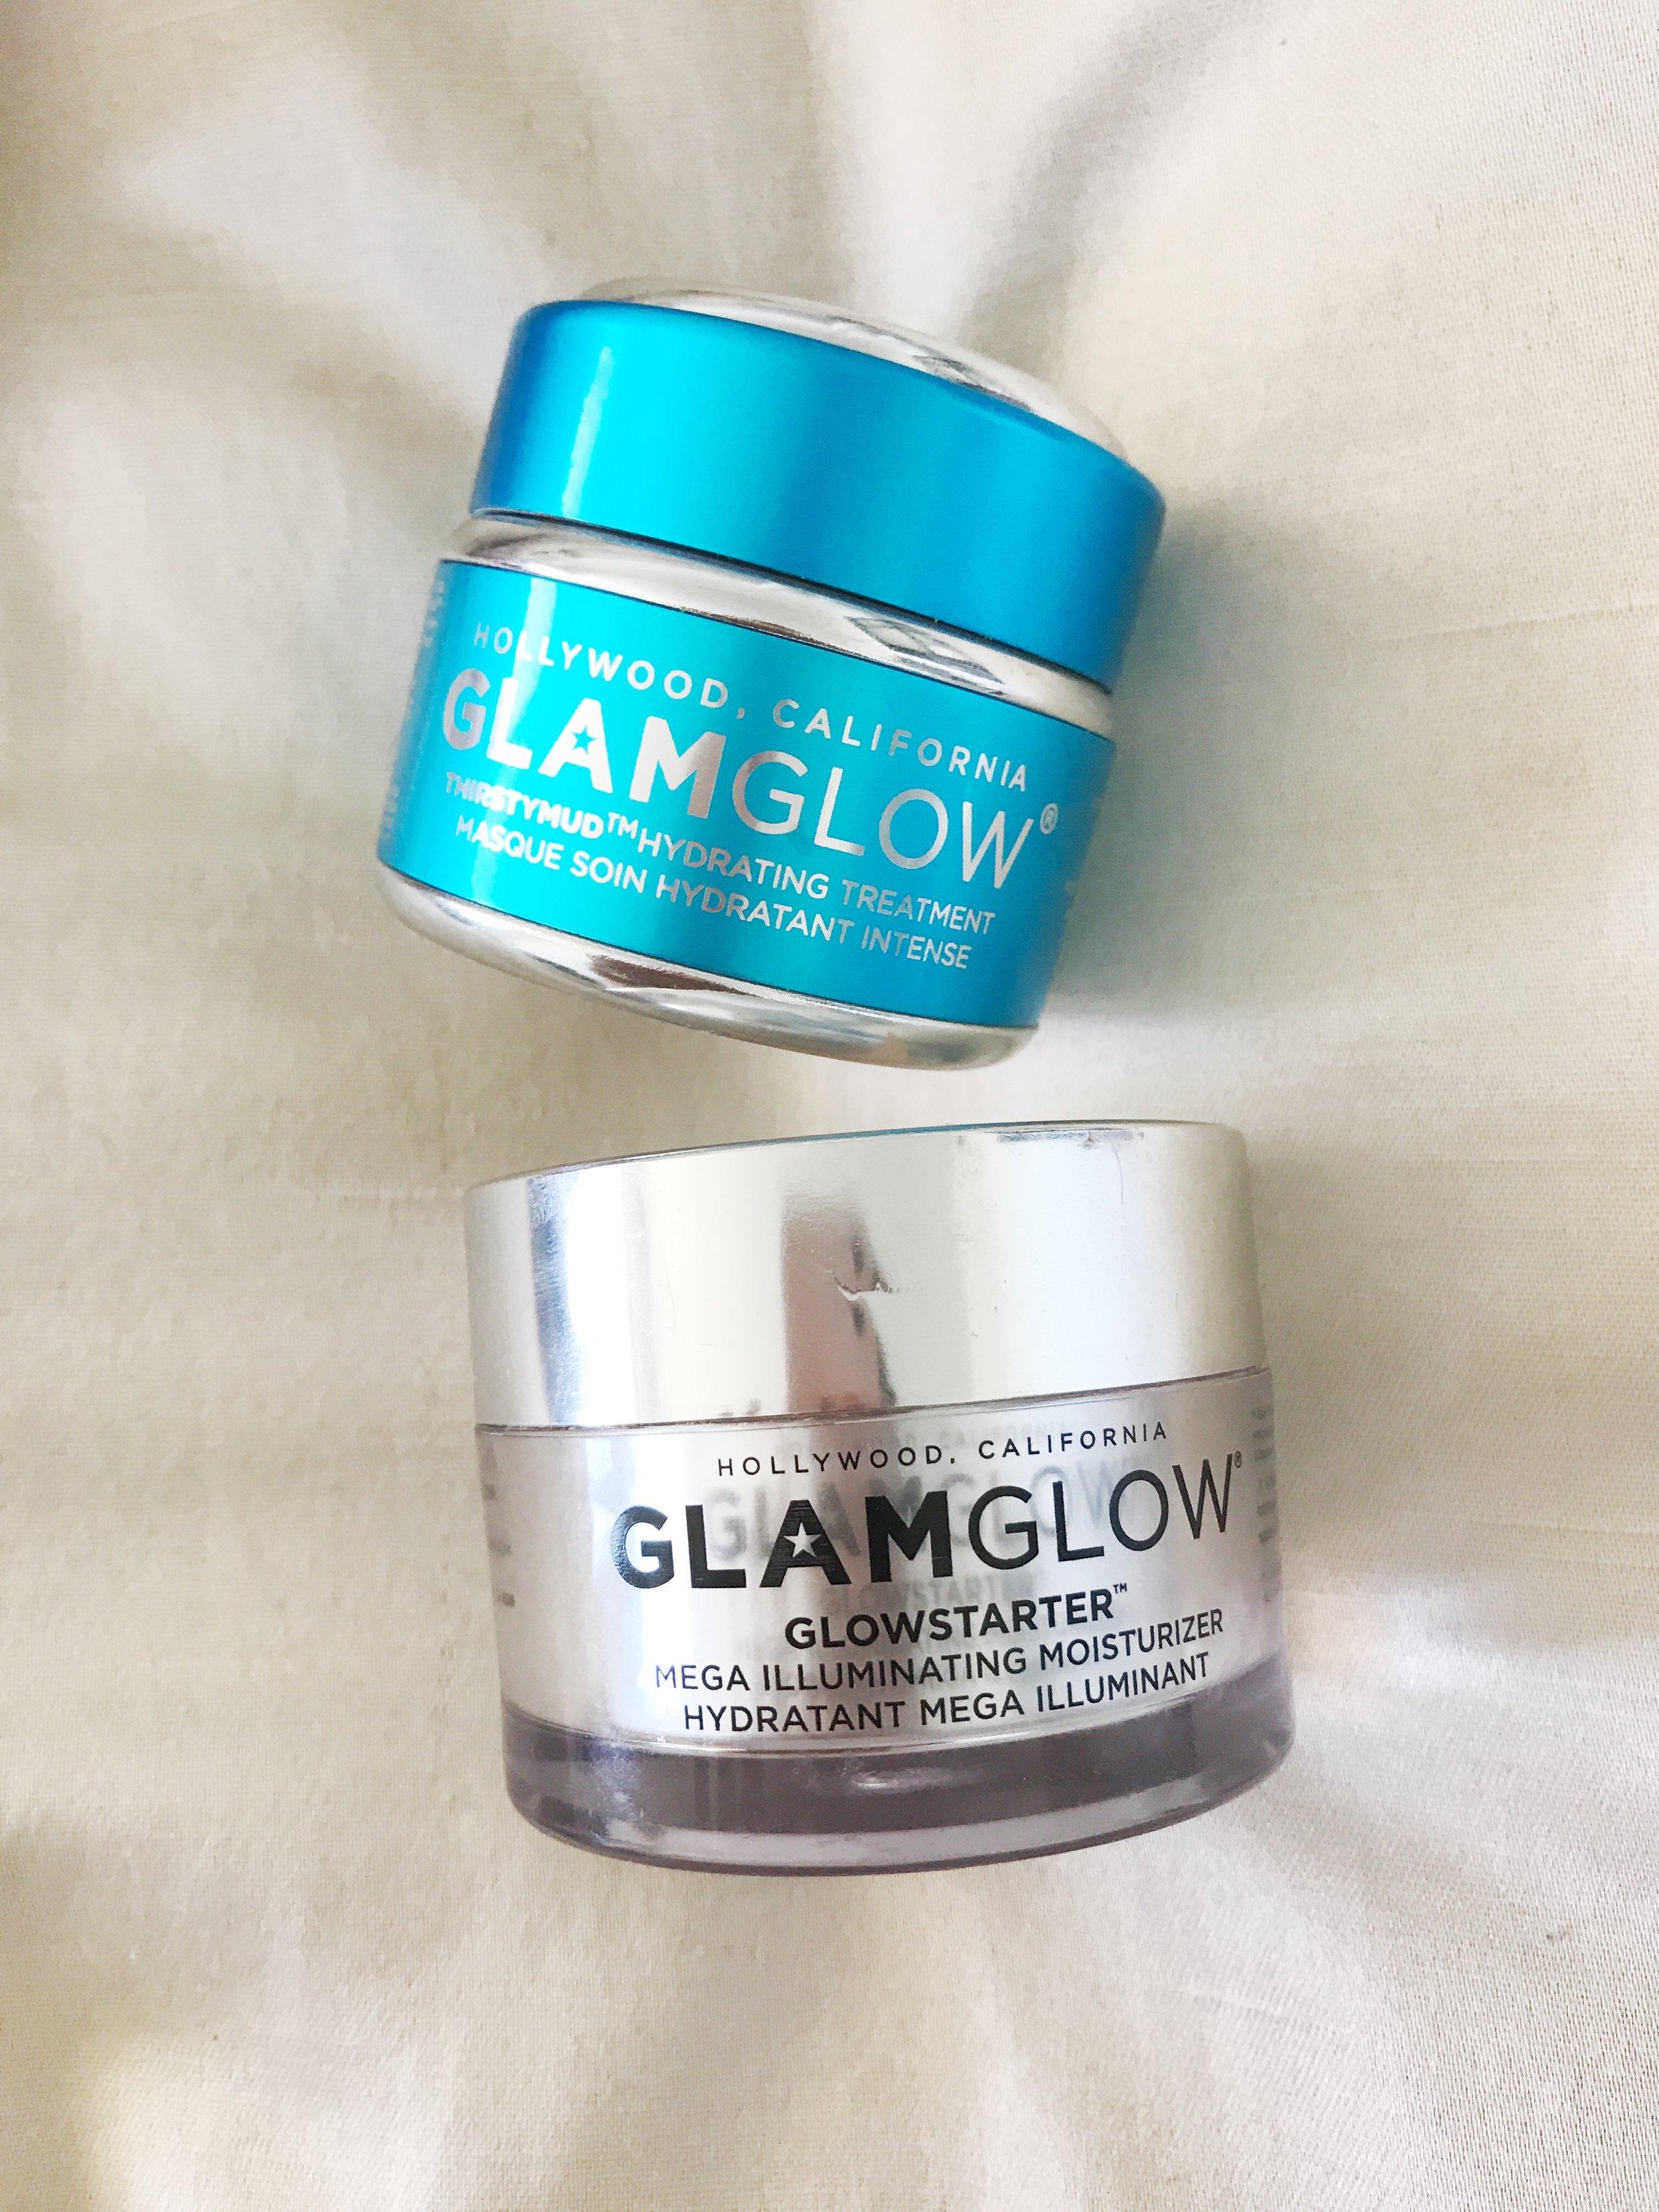 Glamglow Glowstarter Mega Illuminating Moisturizer, and Glamglow ThirstyMud Hydrating Treatment